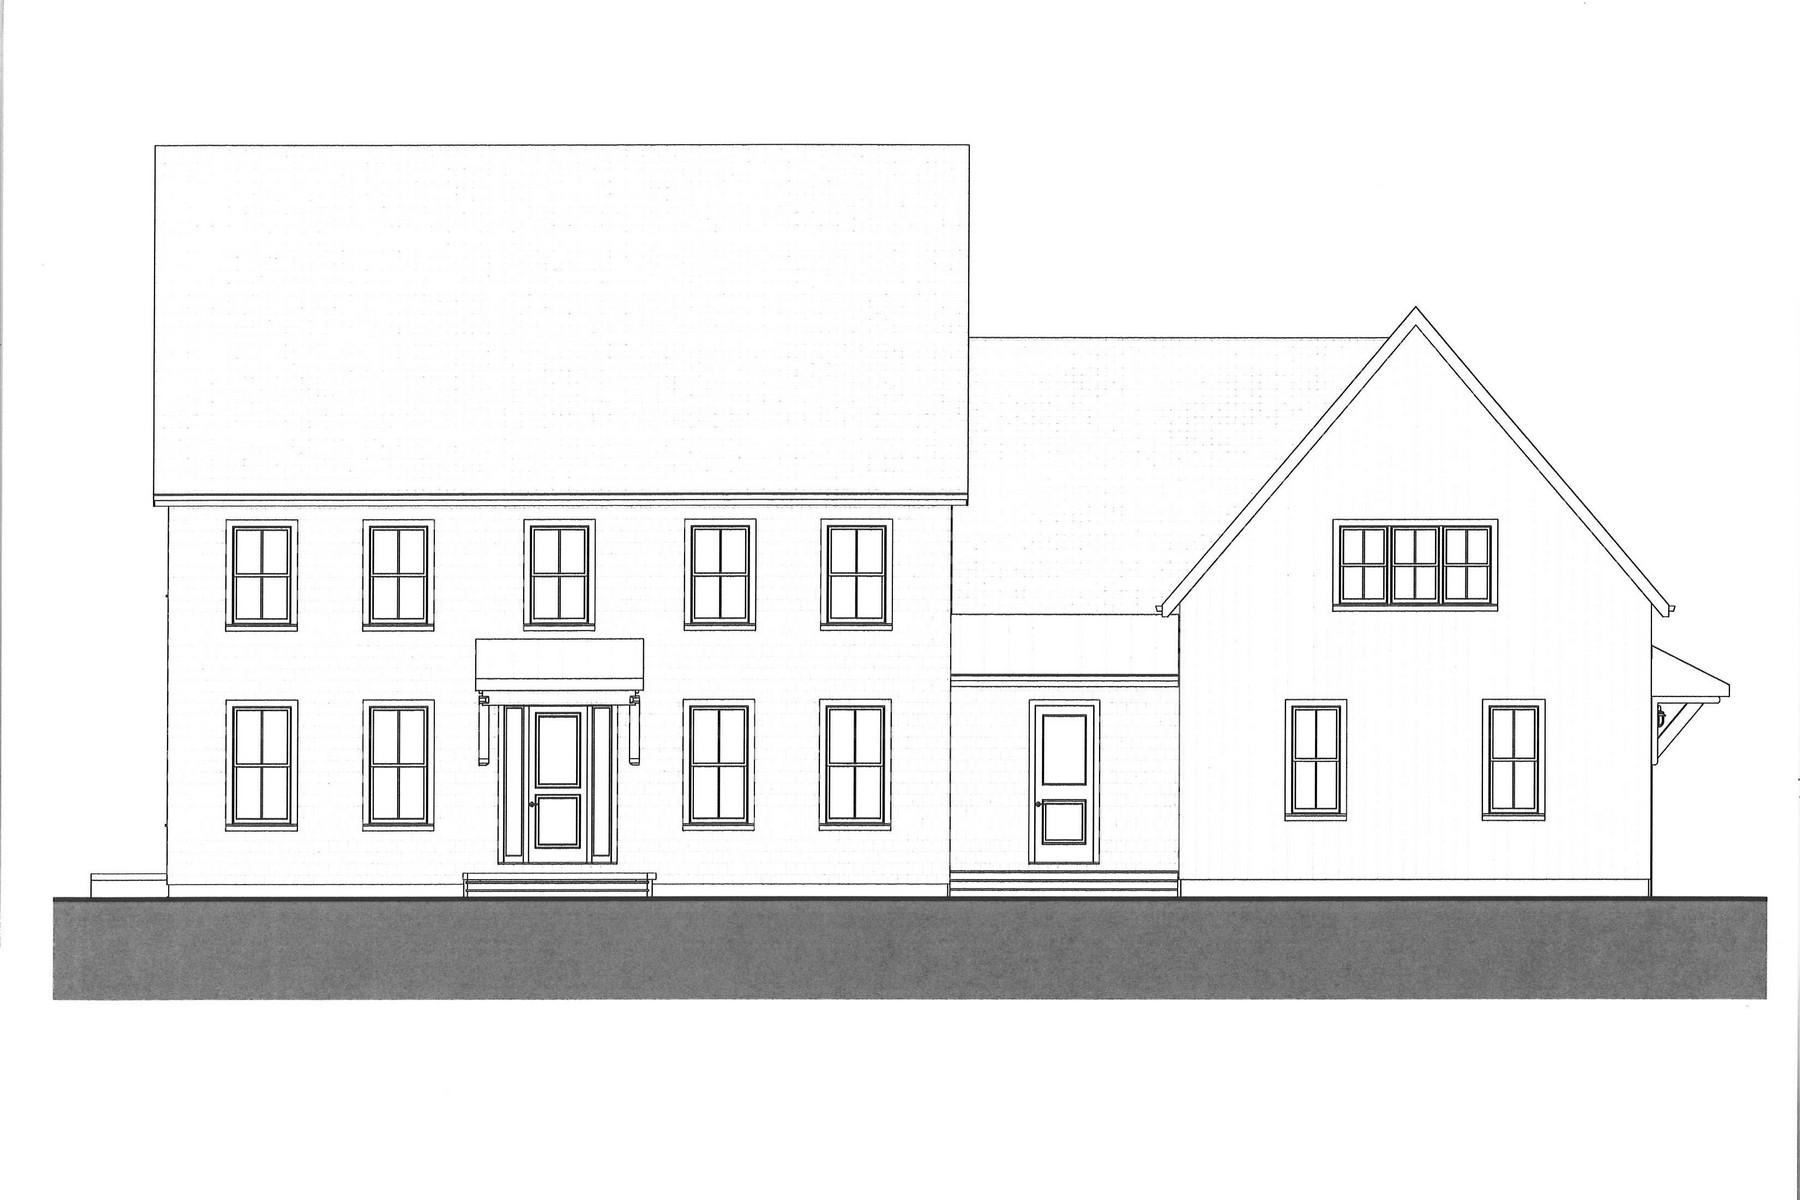 Casa para uma família para Venda às New Construction 131 Old Road Westport, Connecticut 06880 Estados Unidos